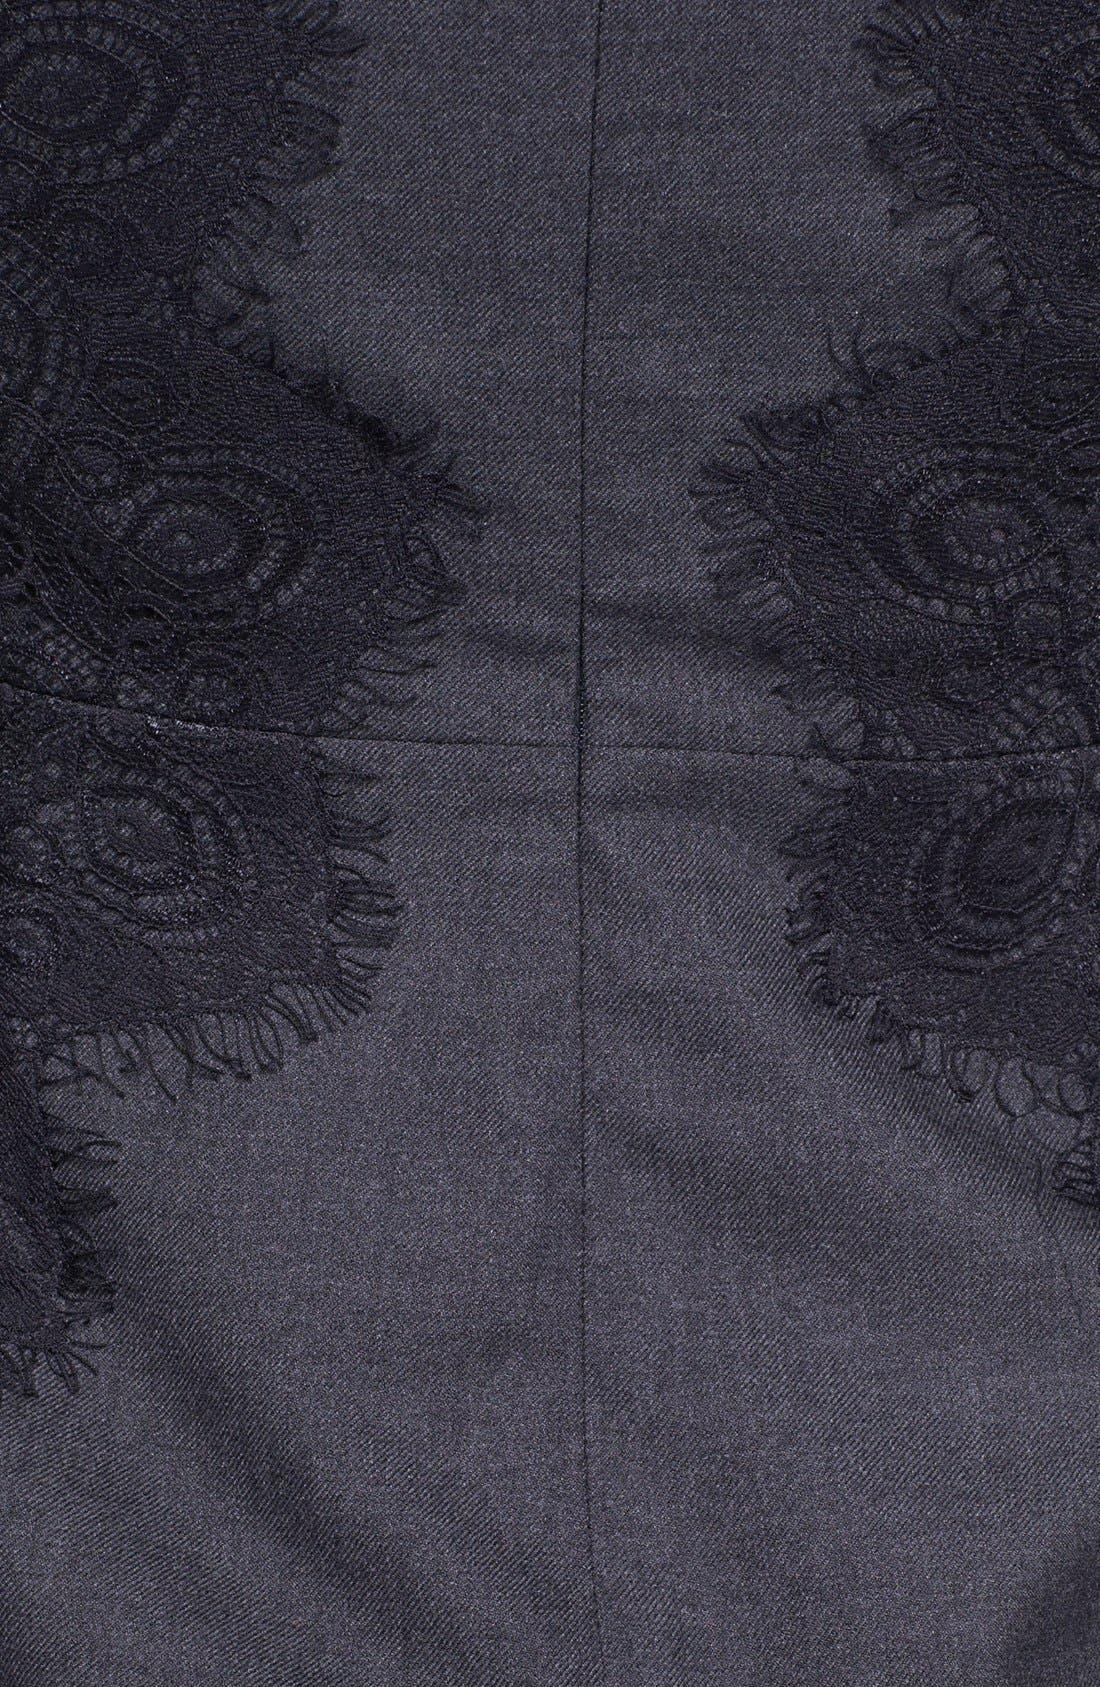 Alternate Image 3  - Tory Burch 'Laney' Lace & Stretch Wool Sheath Dress